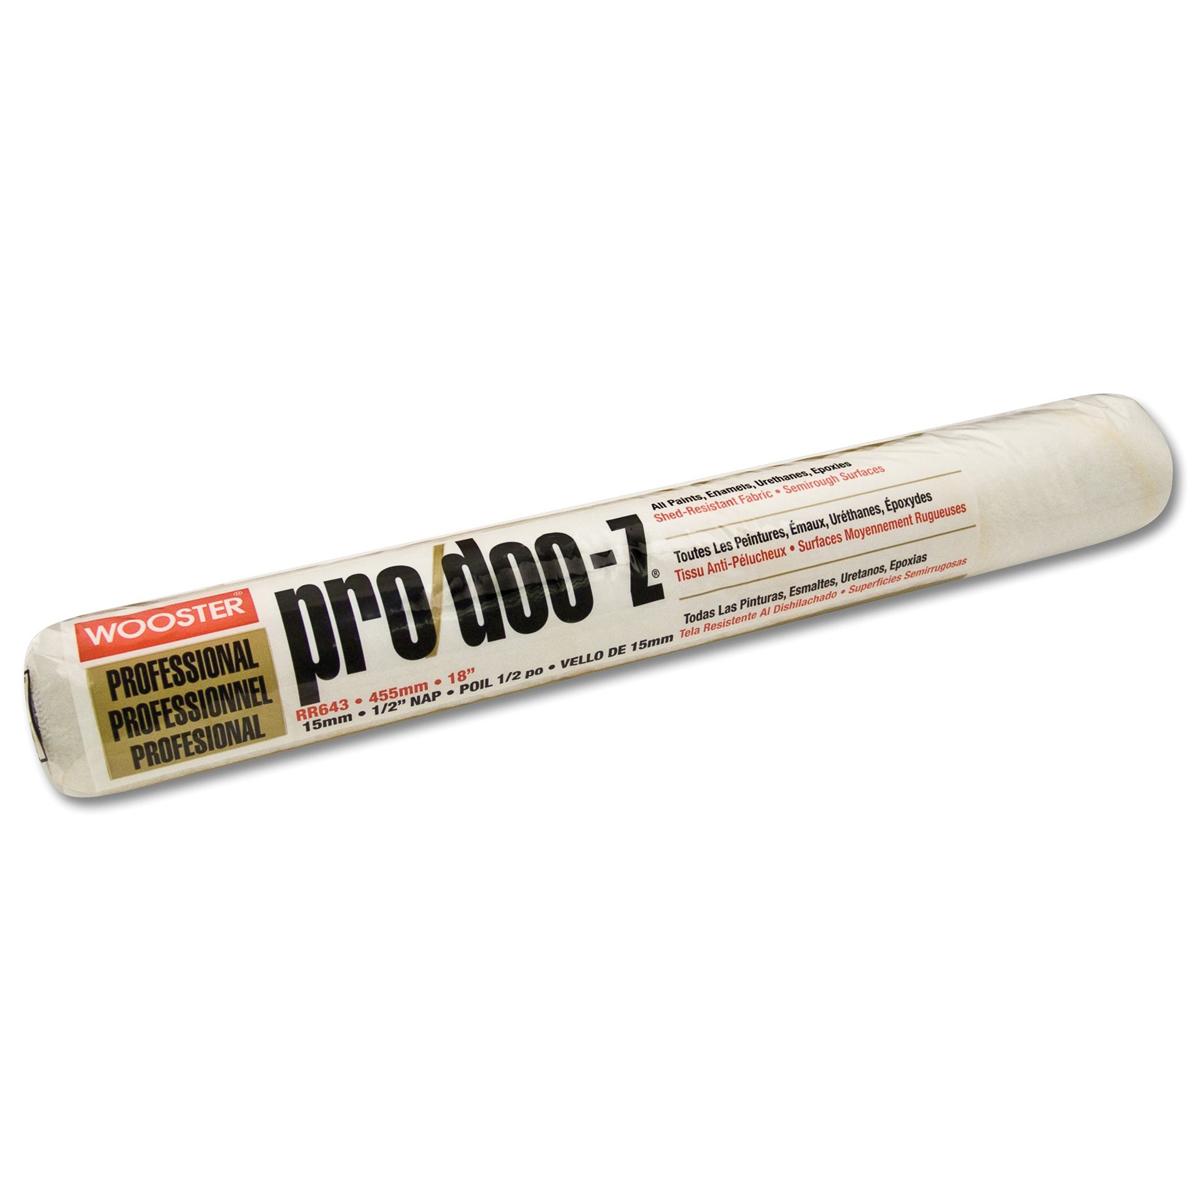 Pack of 6 Wooster Brush RR643-18 Pro//Doo-Z 1//2 Nap Roller Cover